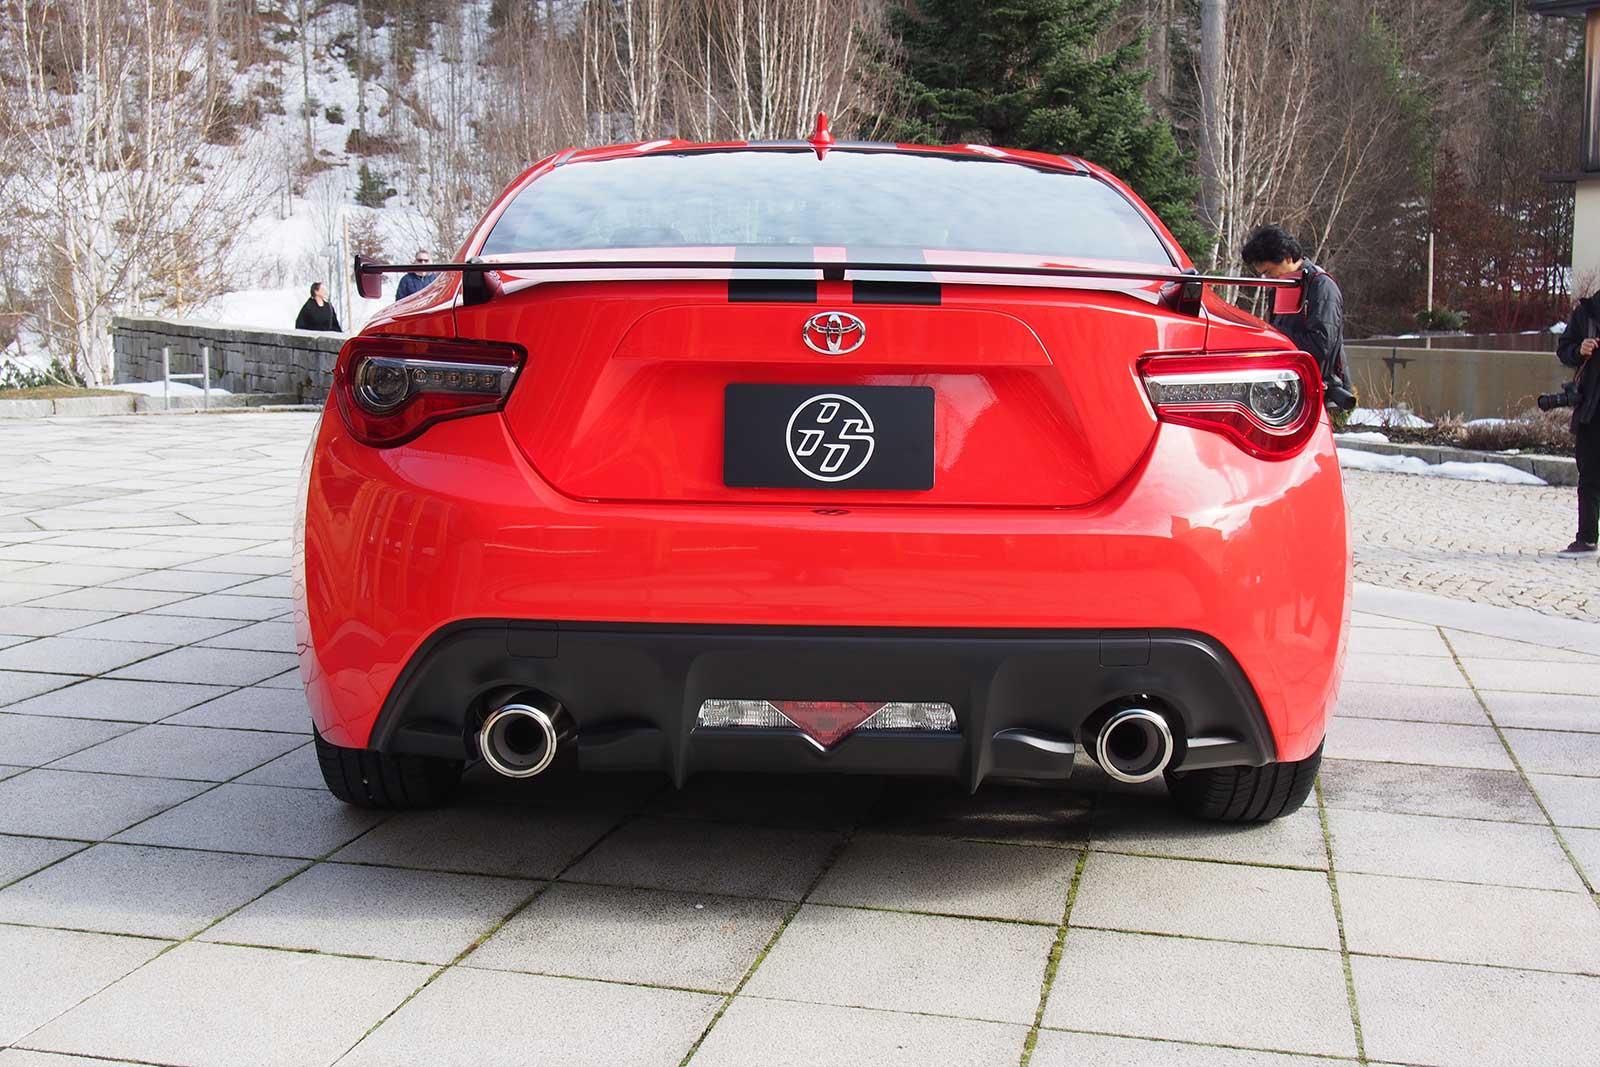 Toyota GT86 860 Special Edition - Autoblog.gr